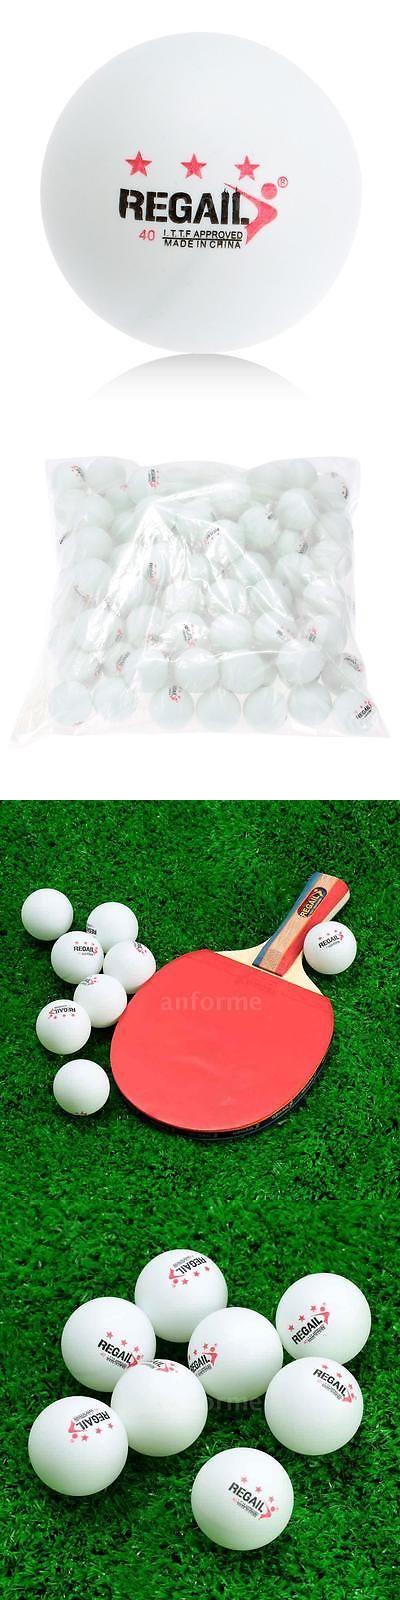 Balls 97073: 500Pcs 3-Star 40Mm Olympic Table Tennis Ball Pingpong Balls White N5k6 -> BUY IT NOW ONLY: $66.52 on eBay!